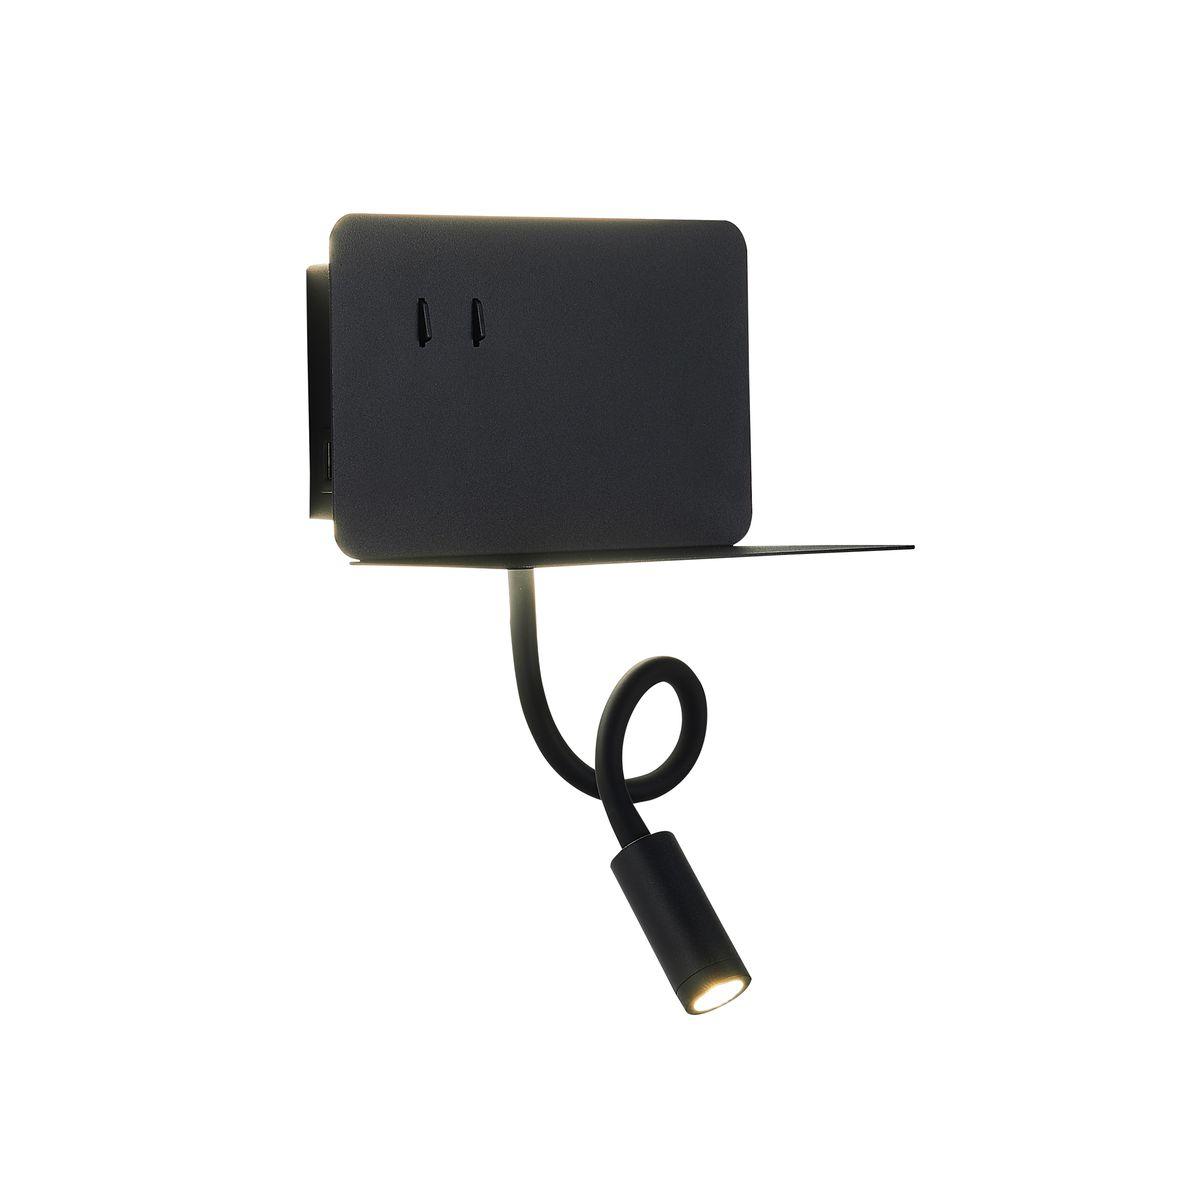 Светильник ST Luce SL1576.401.02 Pinaggio (USB зарядное устройство) зарядное устройство fusechicken gravity lift wgl